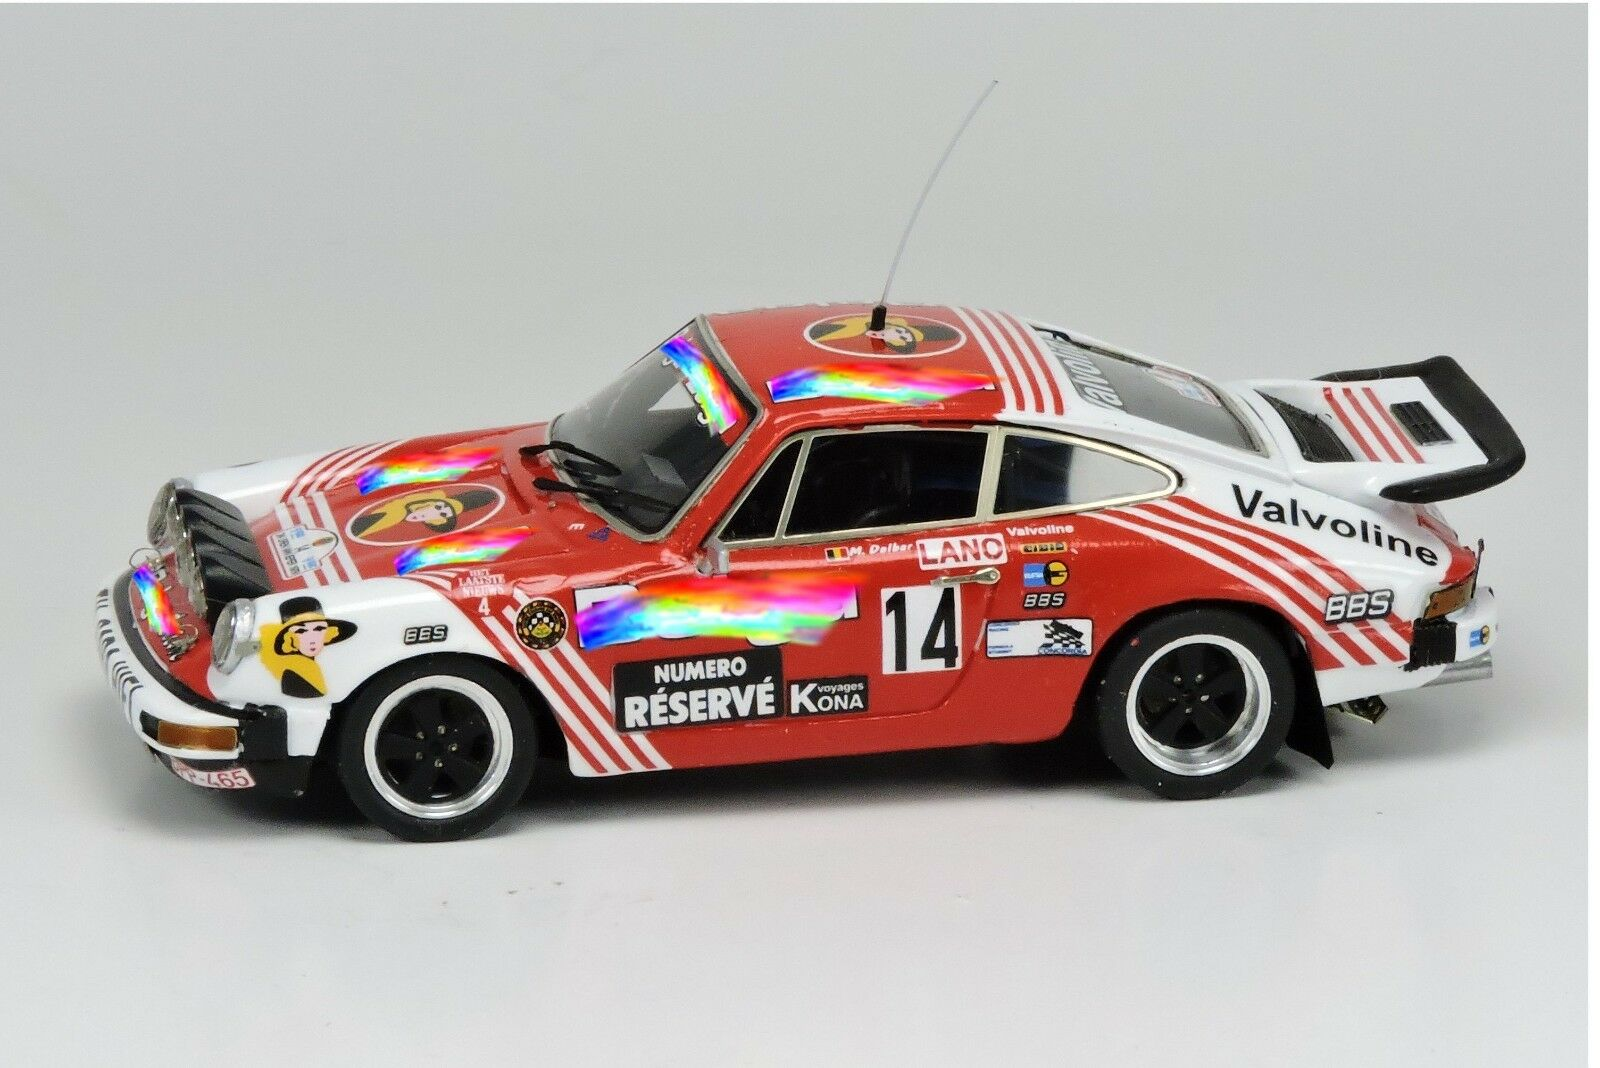 con 60% de descuento kit Porsche 911 911 911 SC Gr.4 Team Belga  14 Ypres 1979 - Arena Models kit 1 43  almacén al por mayor